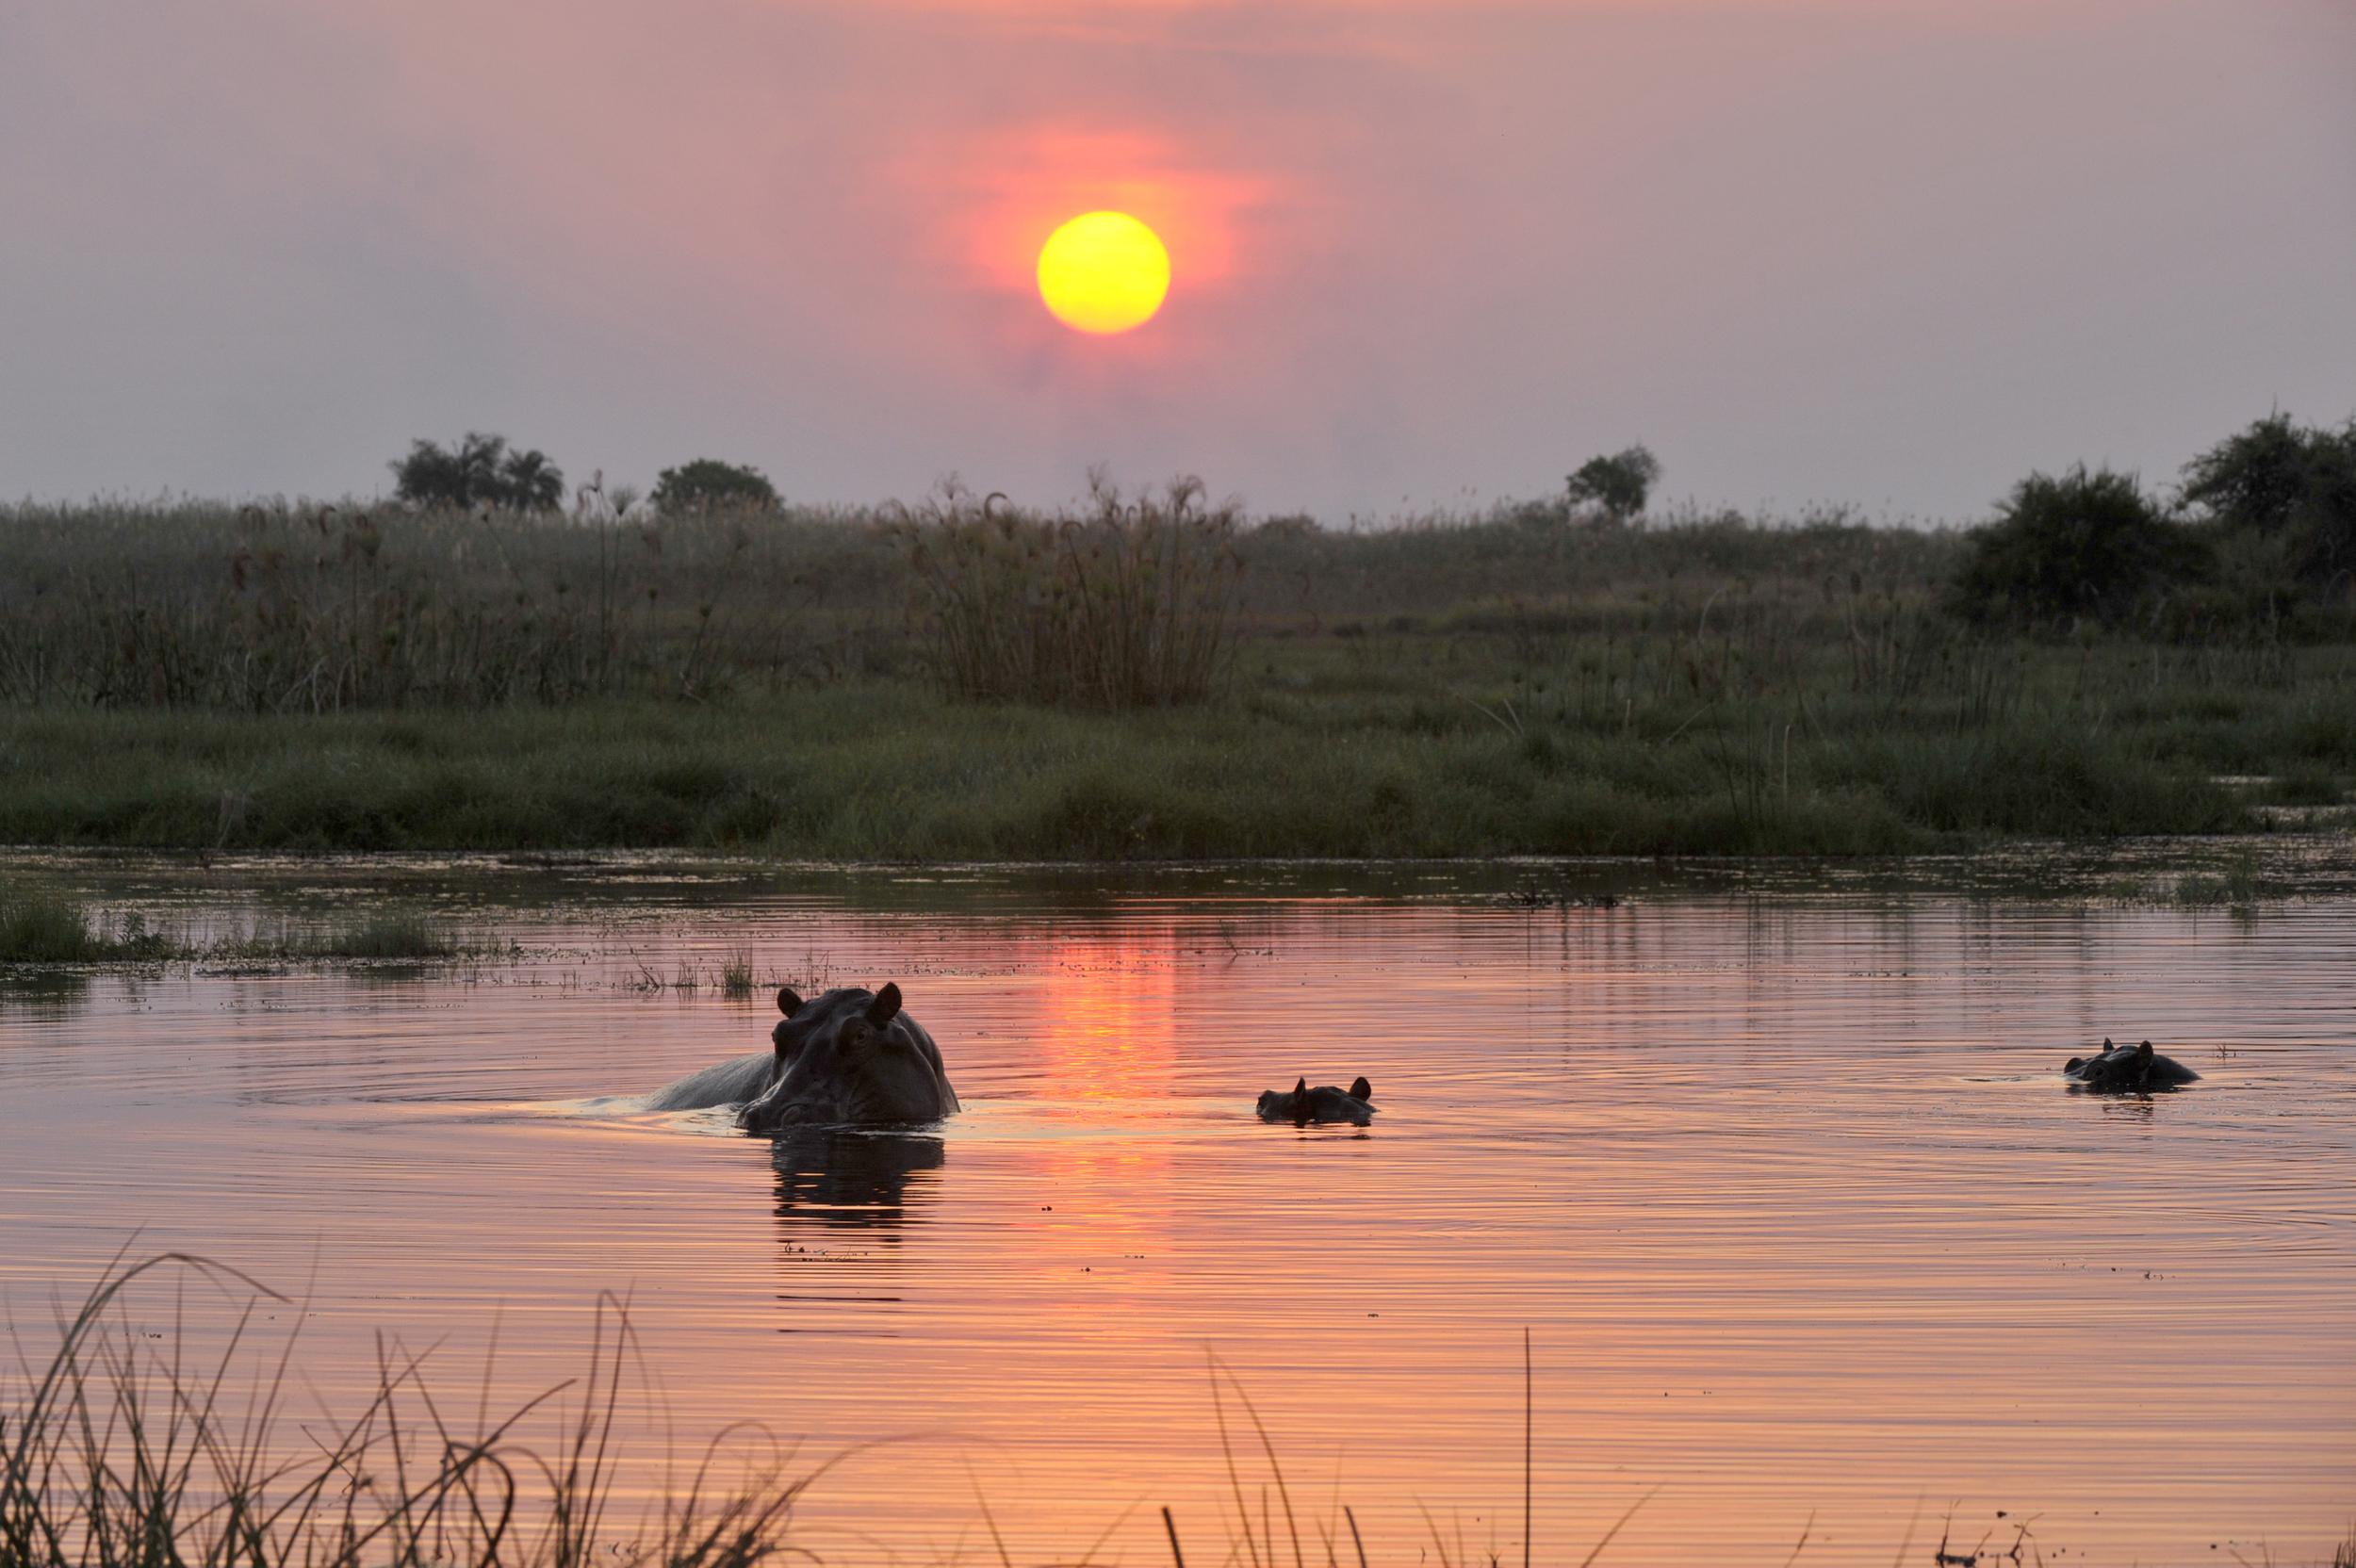 019_Africa-Copyright©ianjohnson2014.jpg